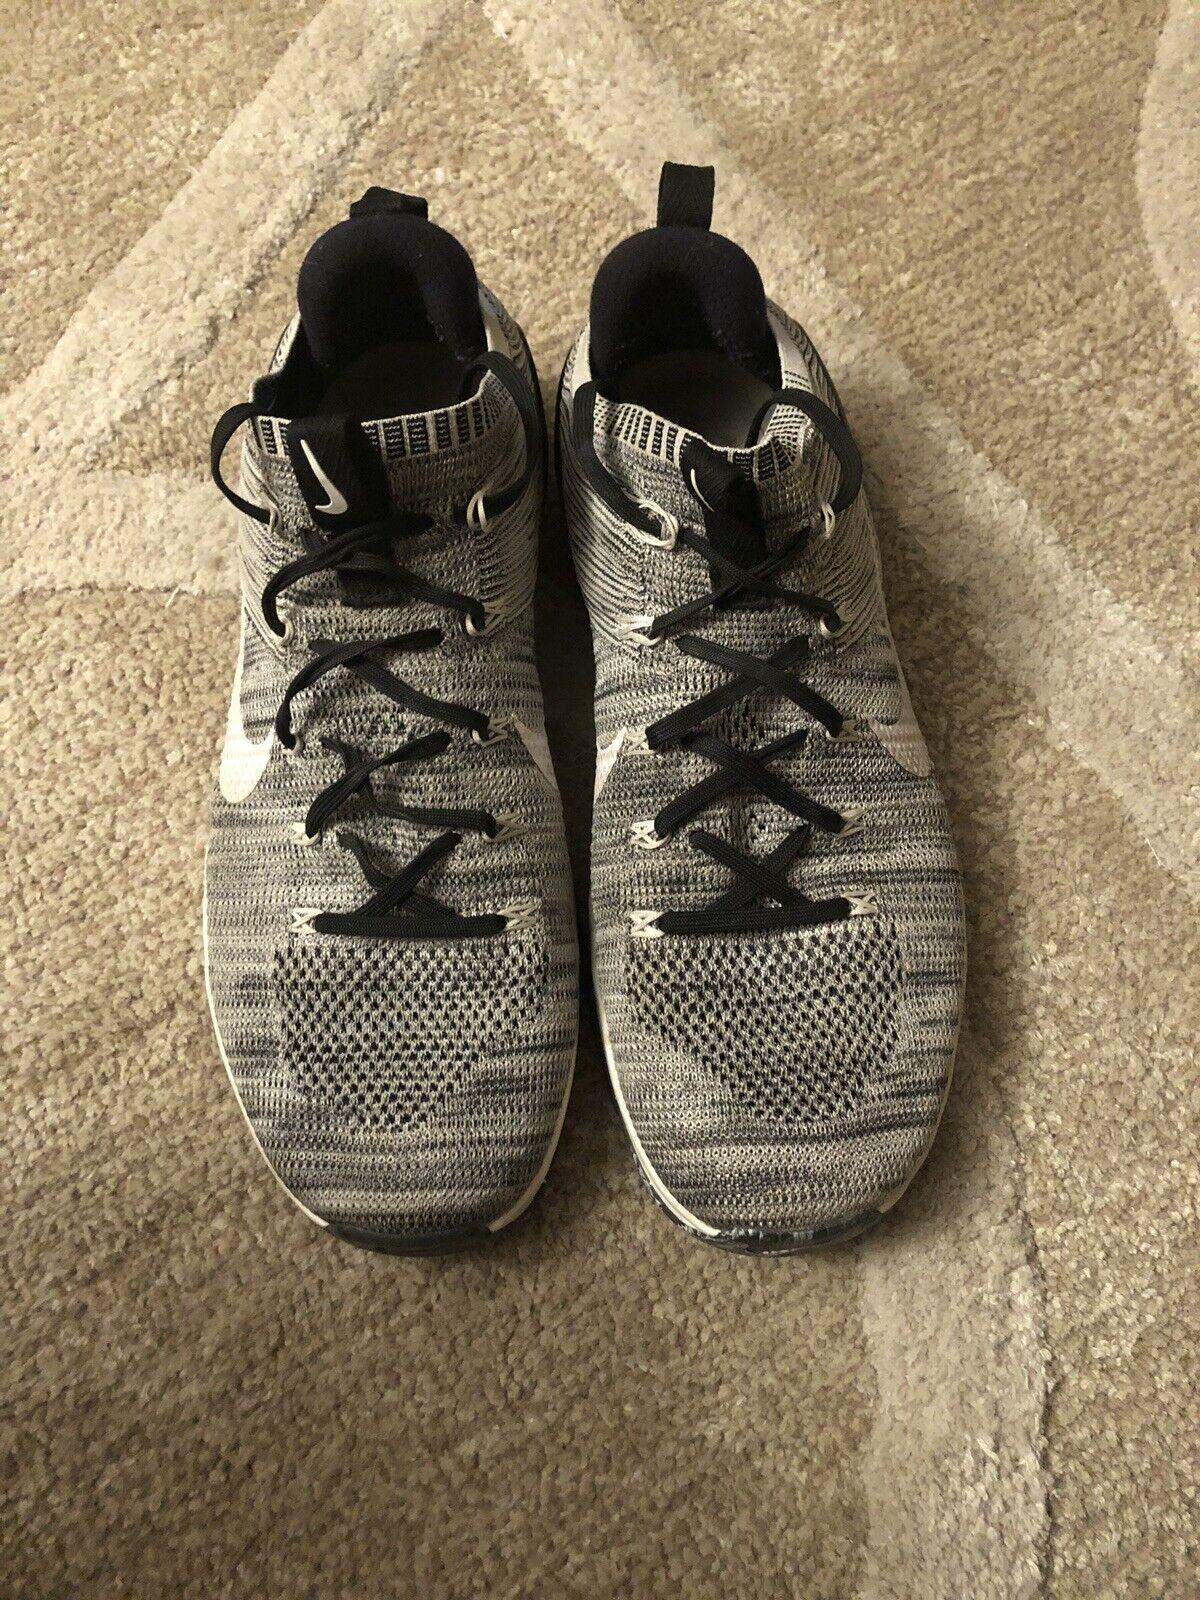 hot sale online 9b9cb 6caaa Nike Metcon DSX DSX DSX Flyknit2 Men SZ 12 Cross Training Matte Silver Sail  924423-